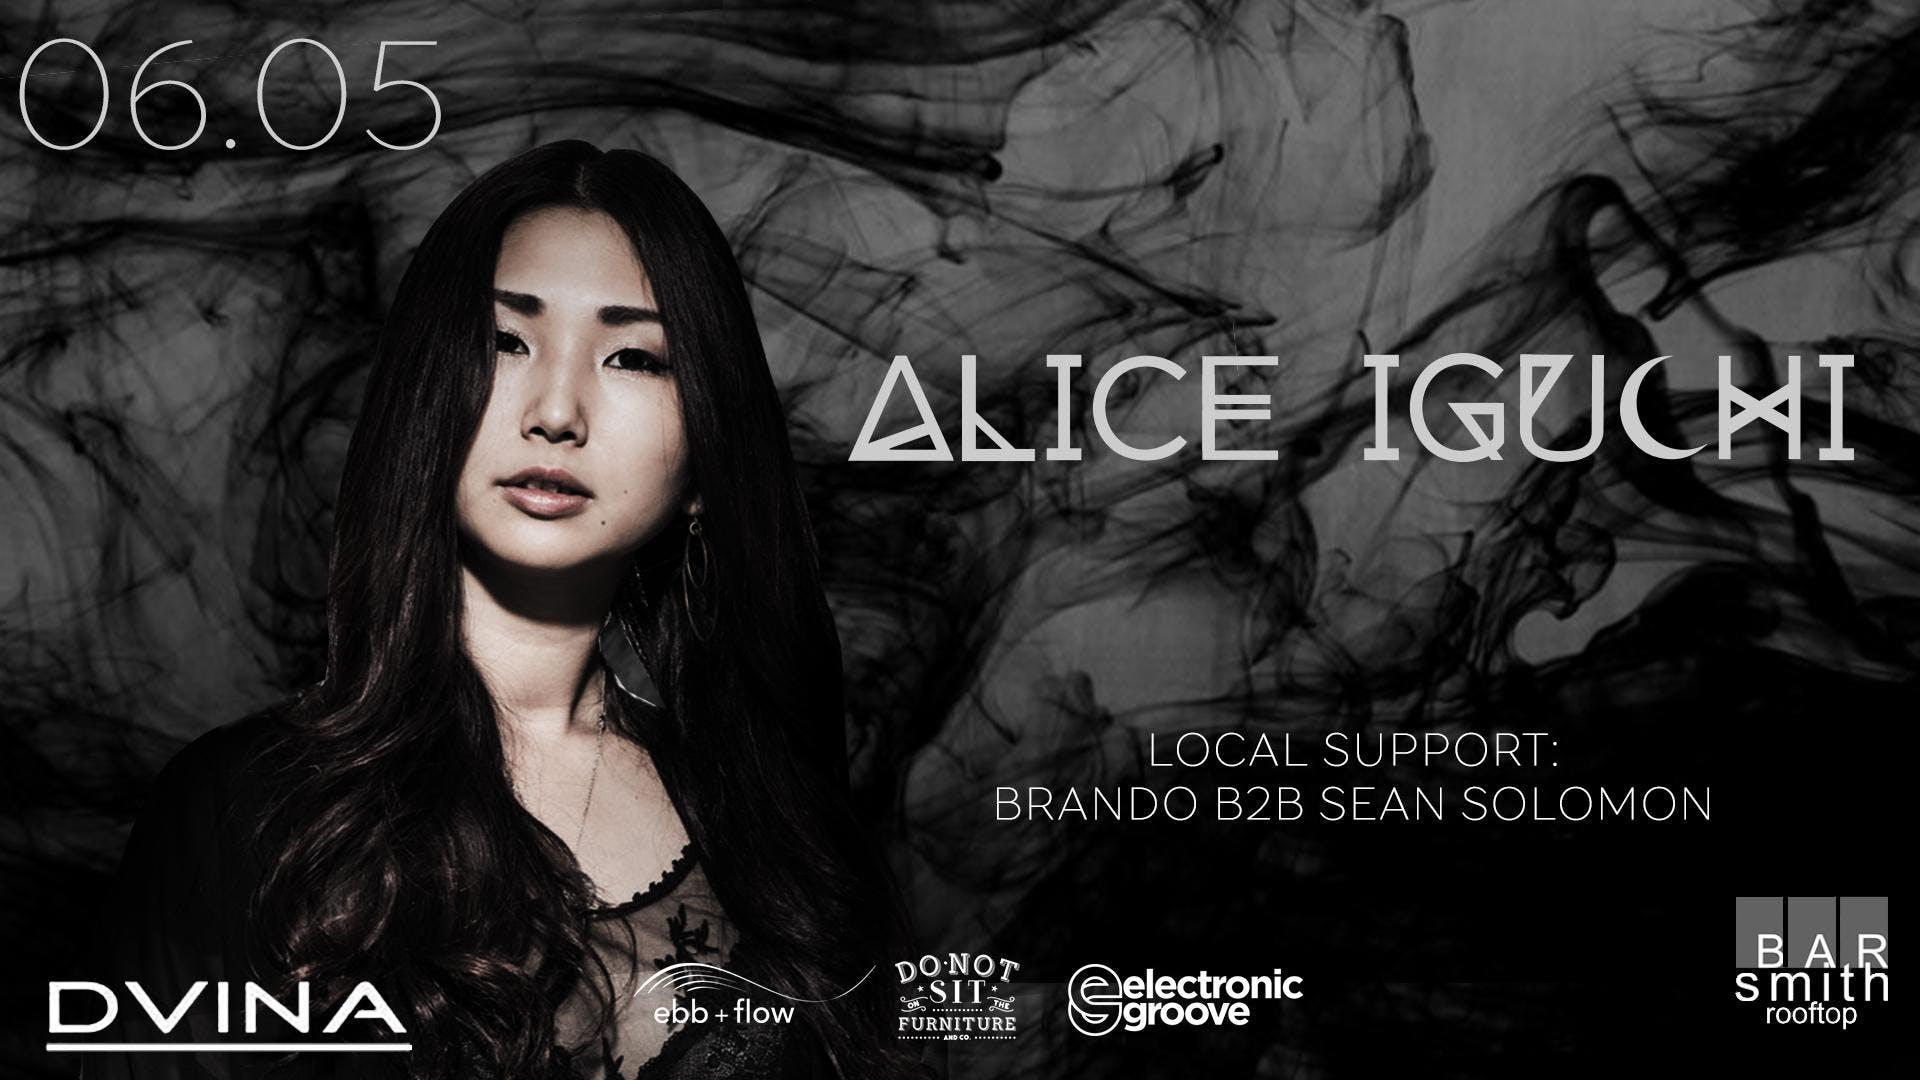 DVINA Wednesdays: Alice Iguchi